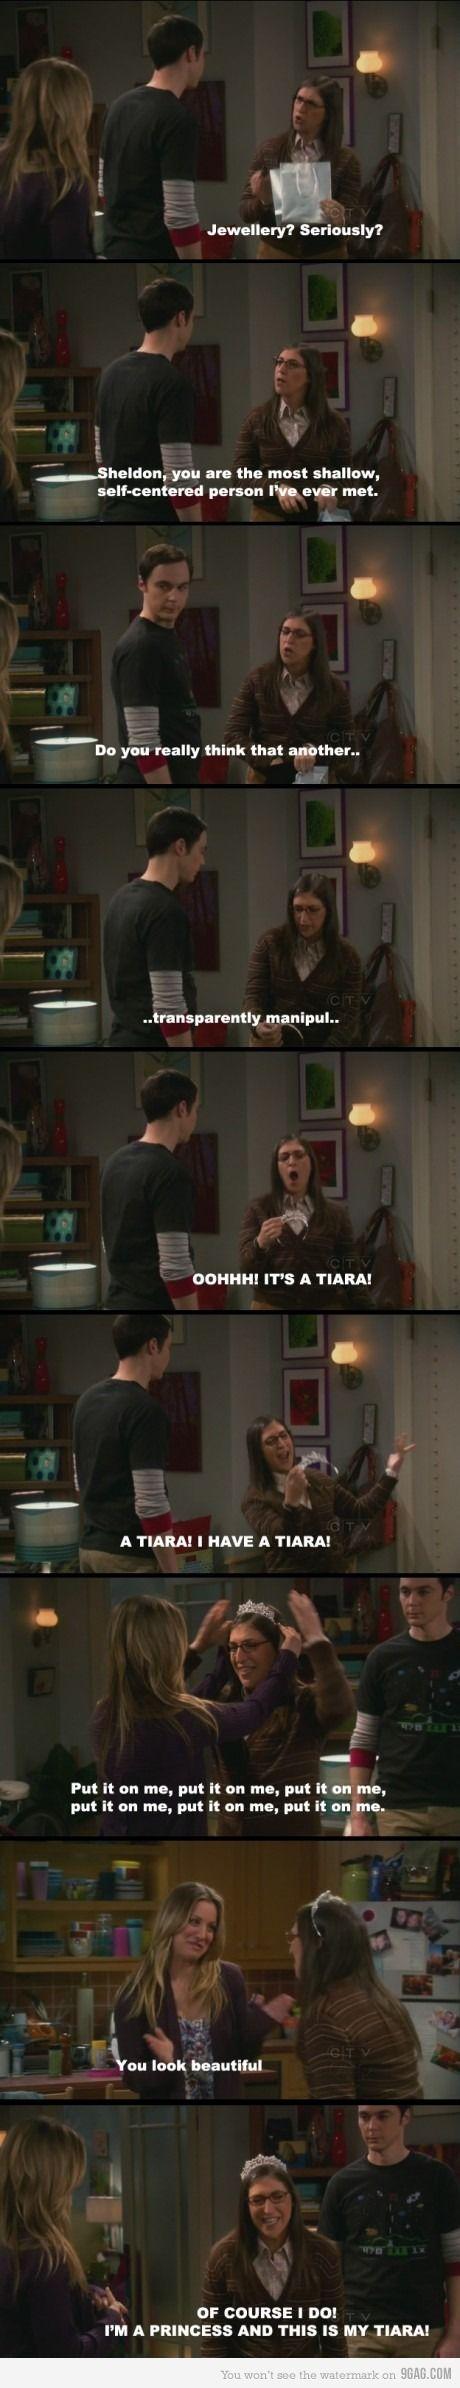 That's Sheldon alright